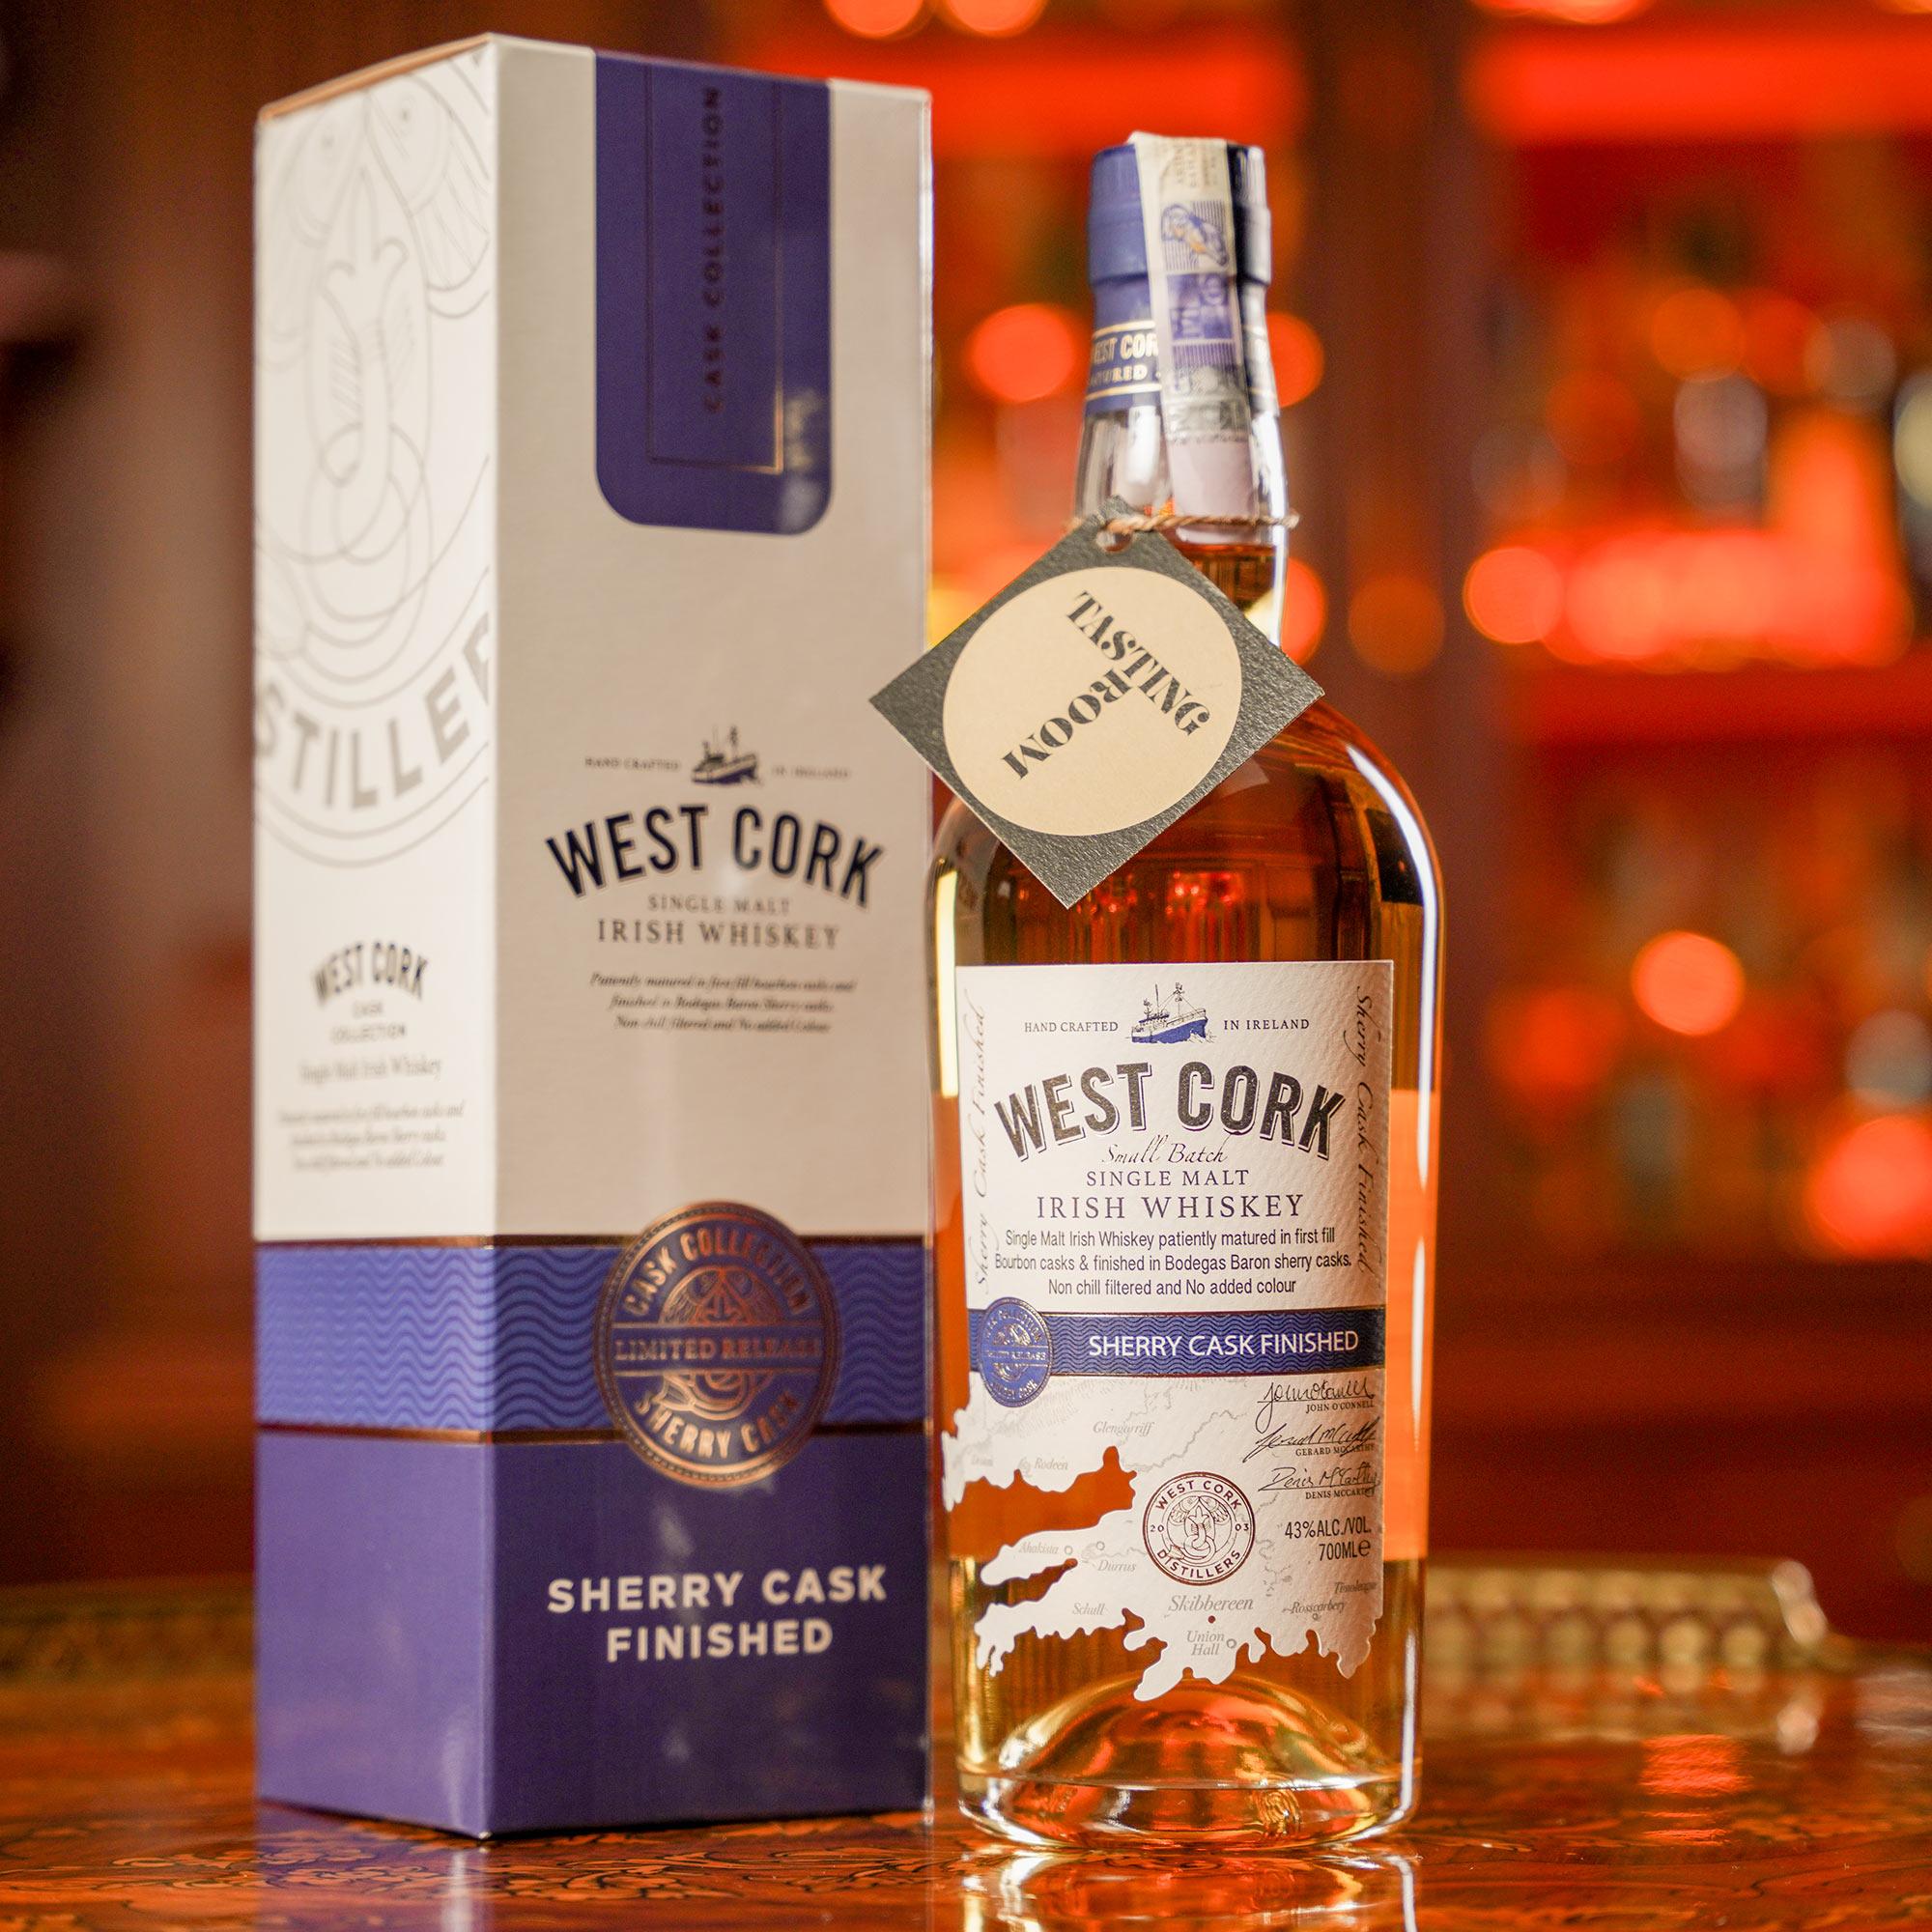 West Cork Sherry Cask Finished /Уест Корк Шери Каск Финиш